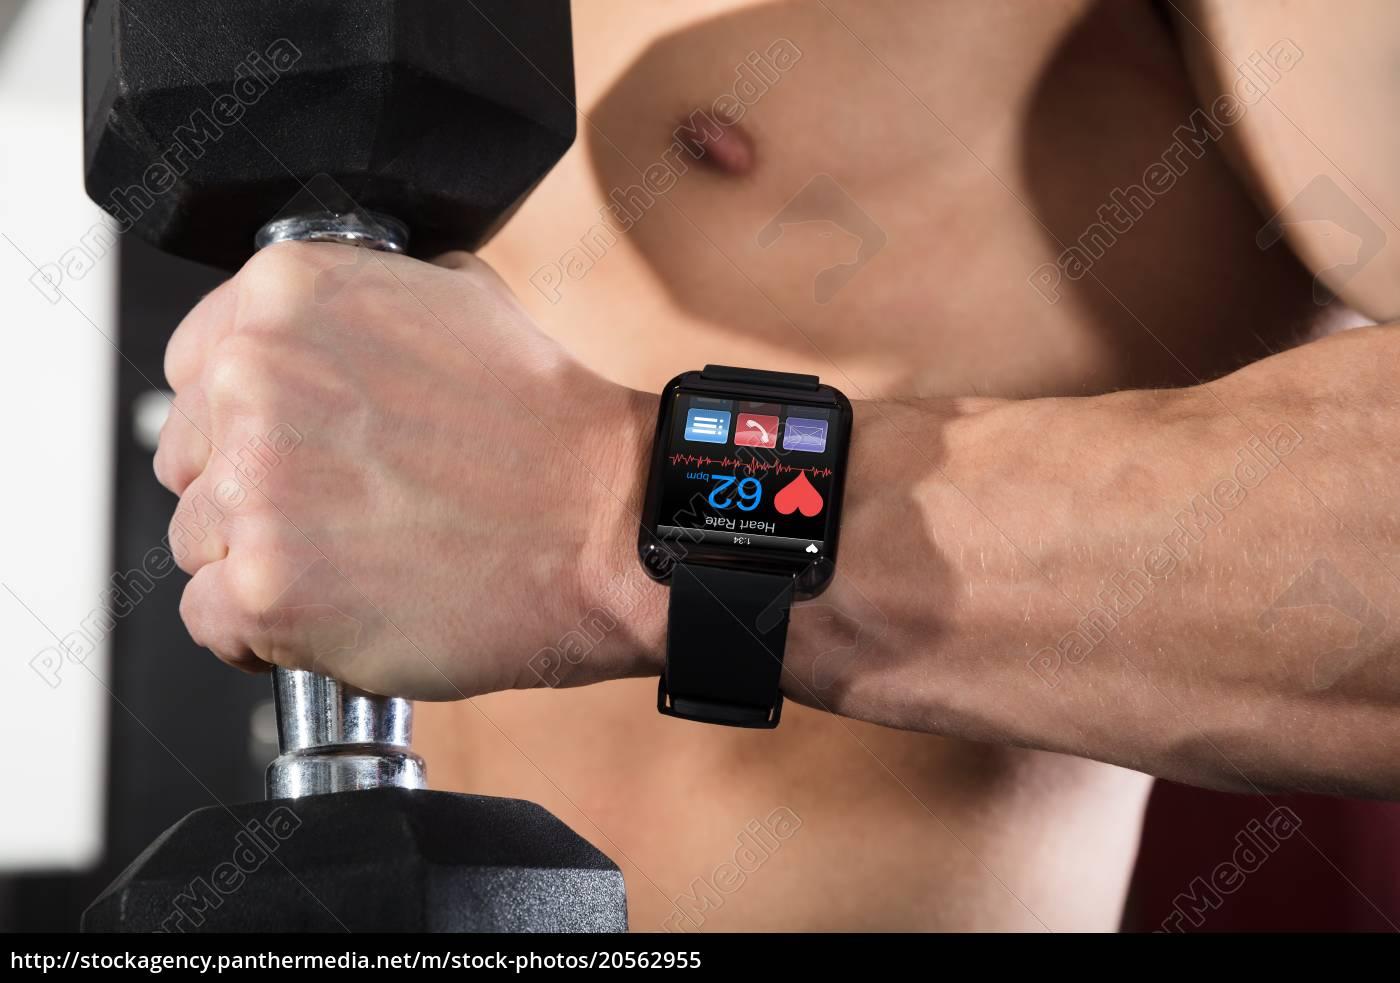 an, athlete, man, holding, dumbbell - 20562955